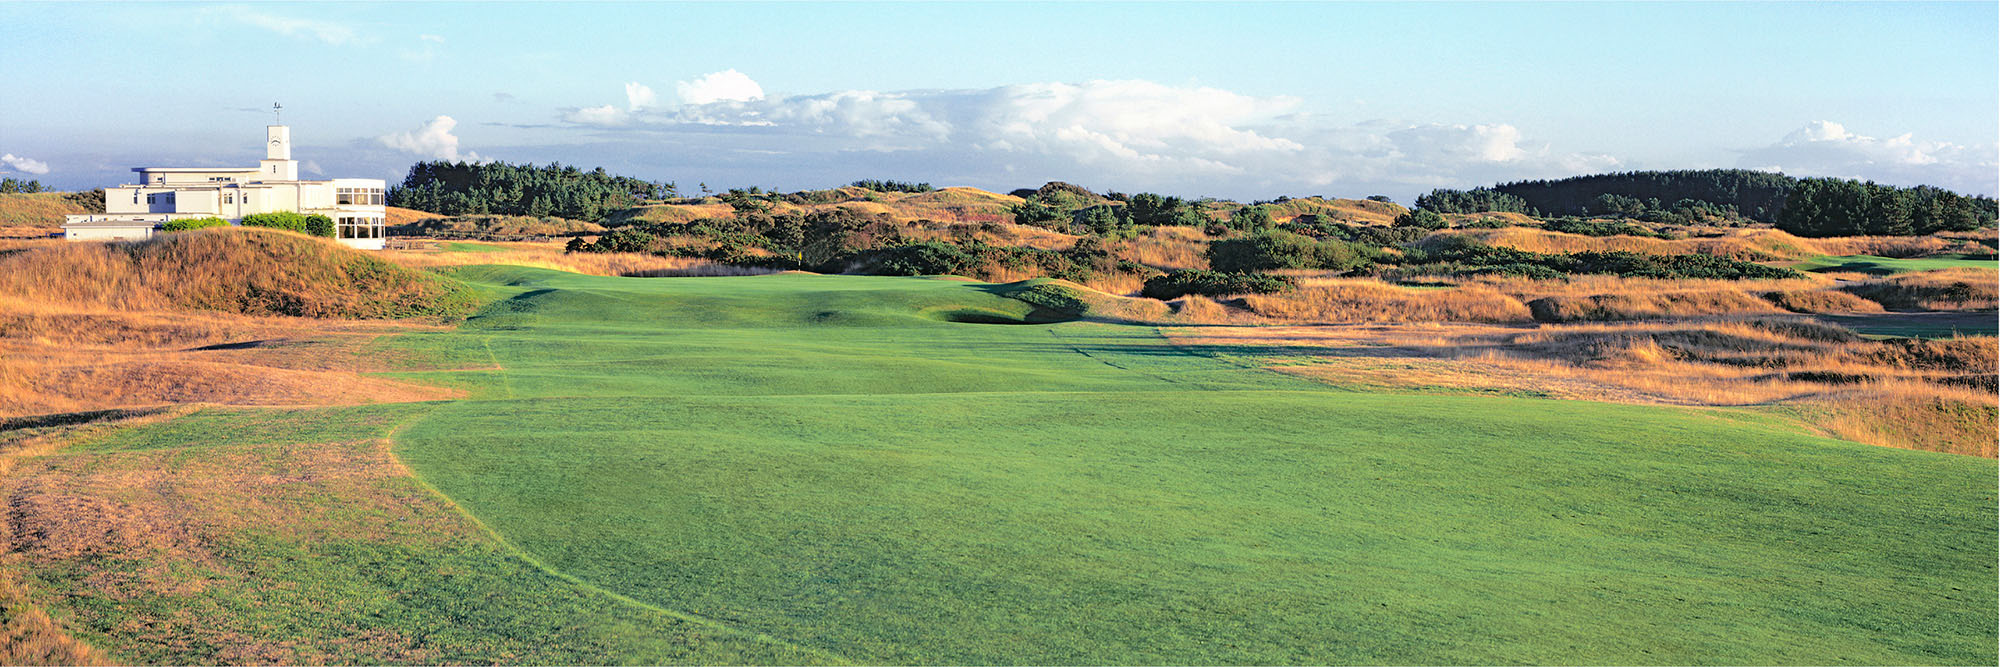 Golf Course Image - Royal Birkdale No. 9